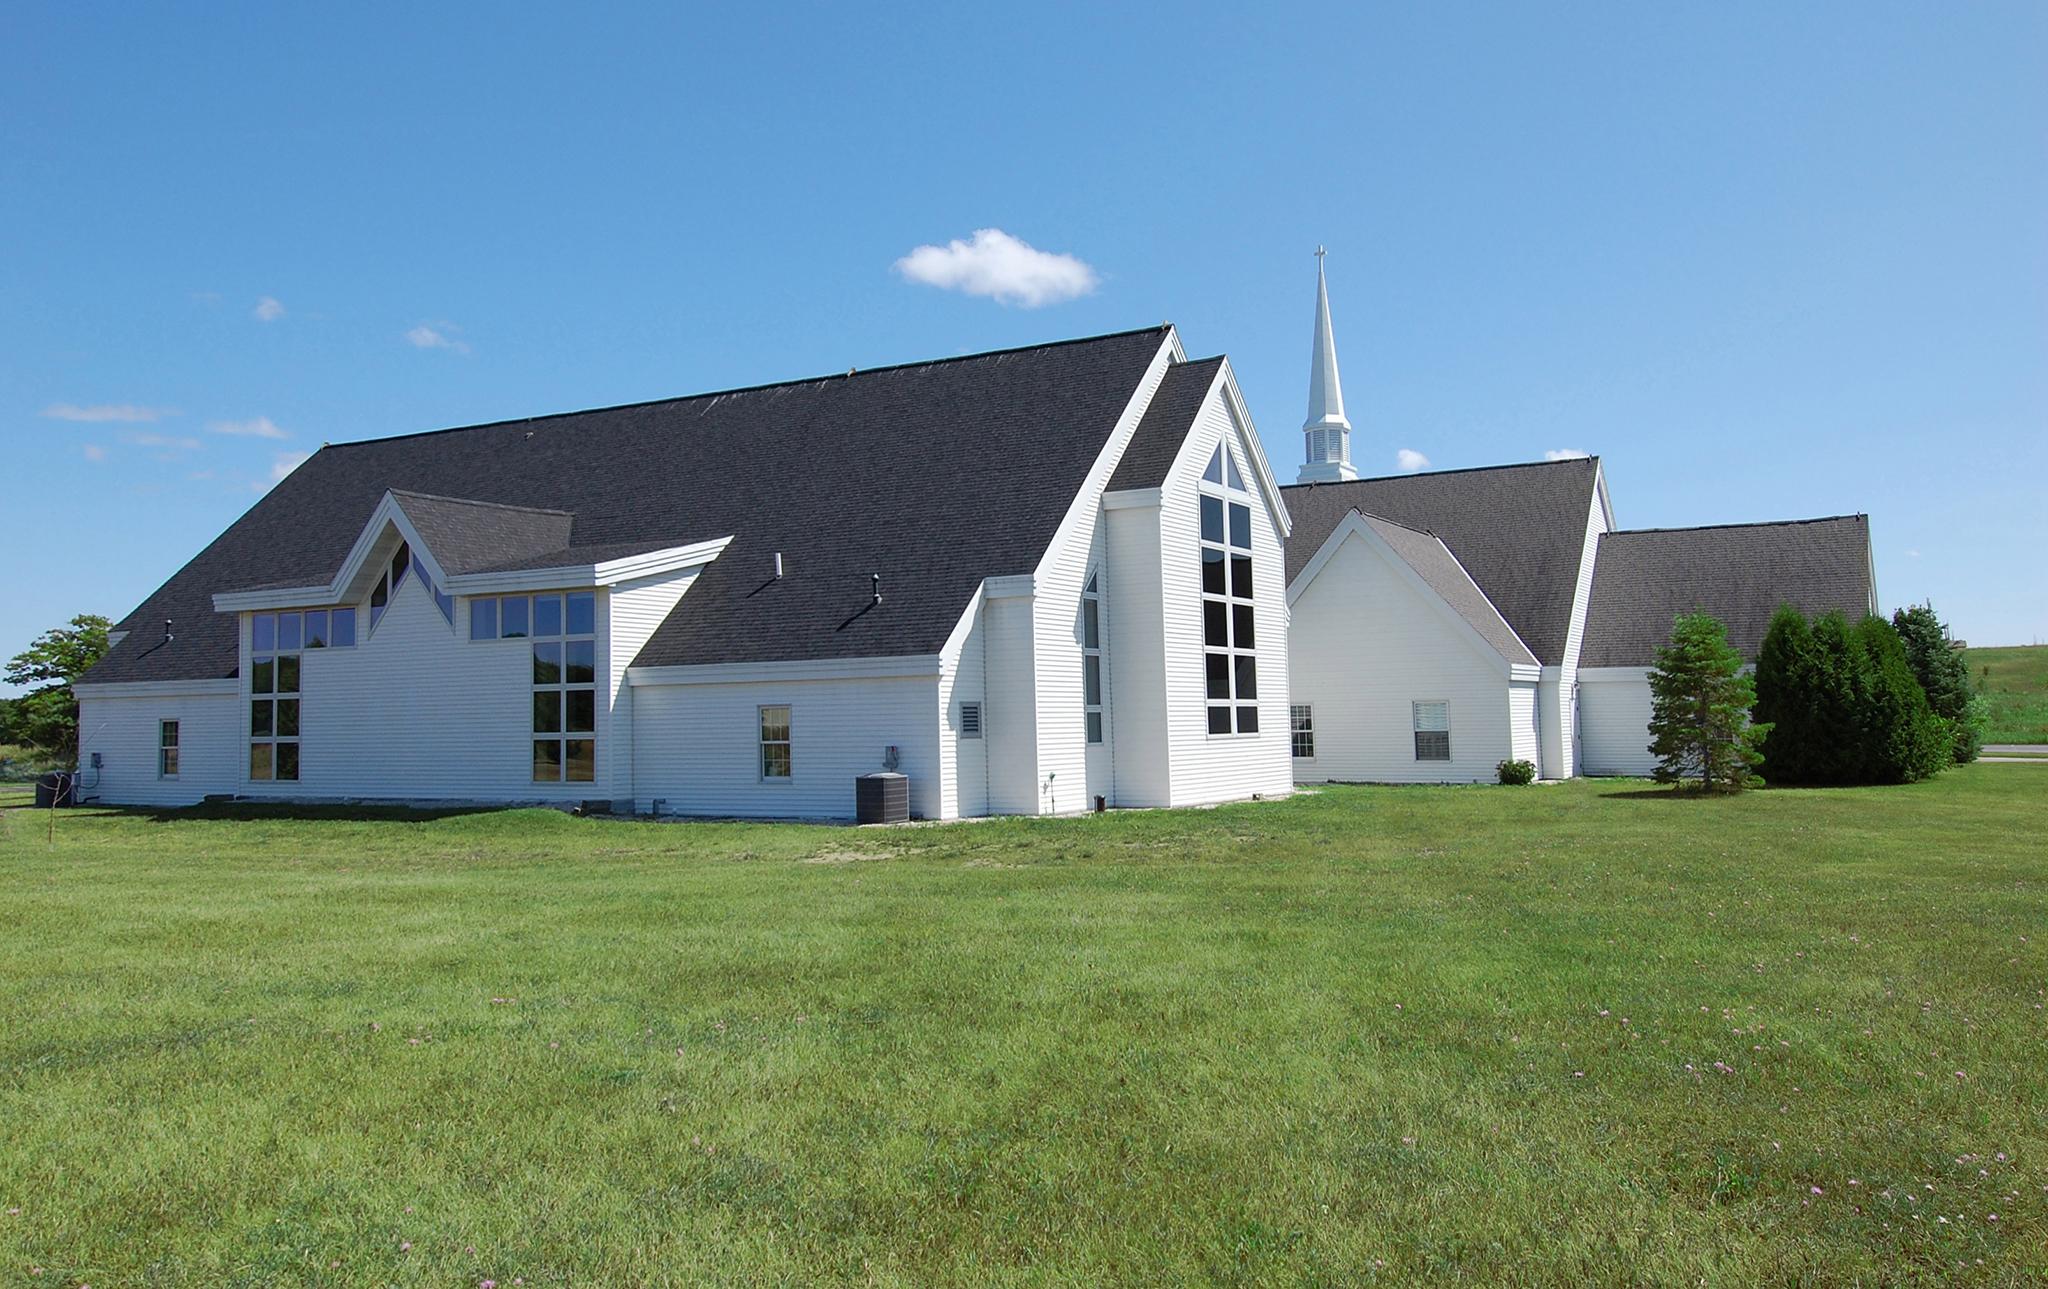 6_Shepherd of the Bay Lutheran Church